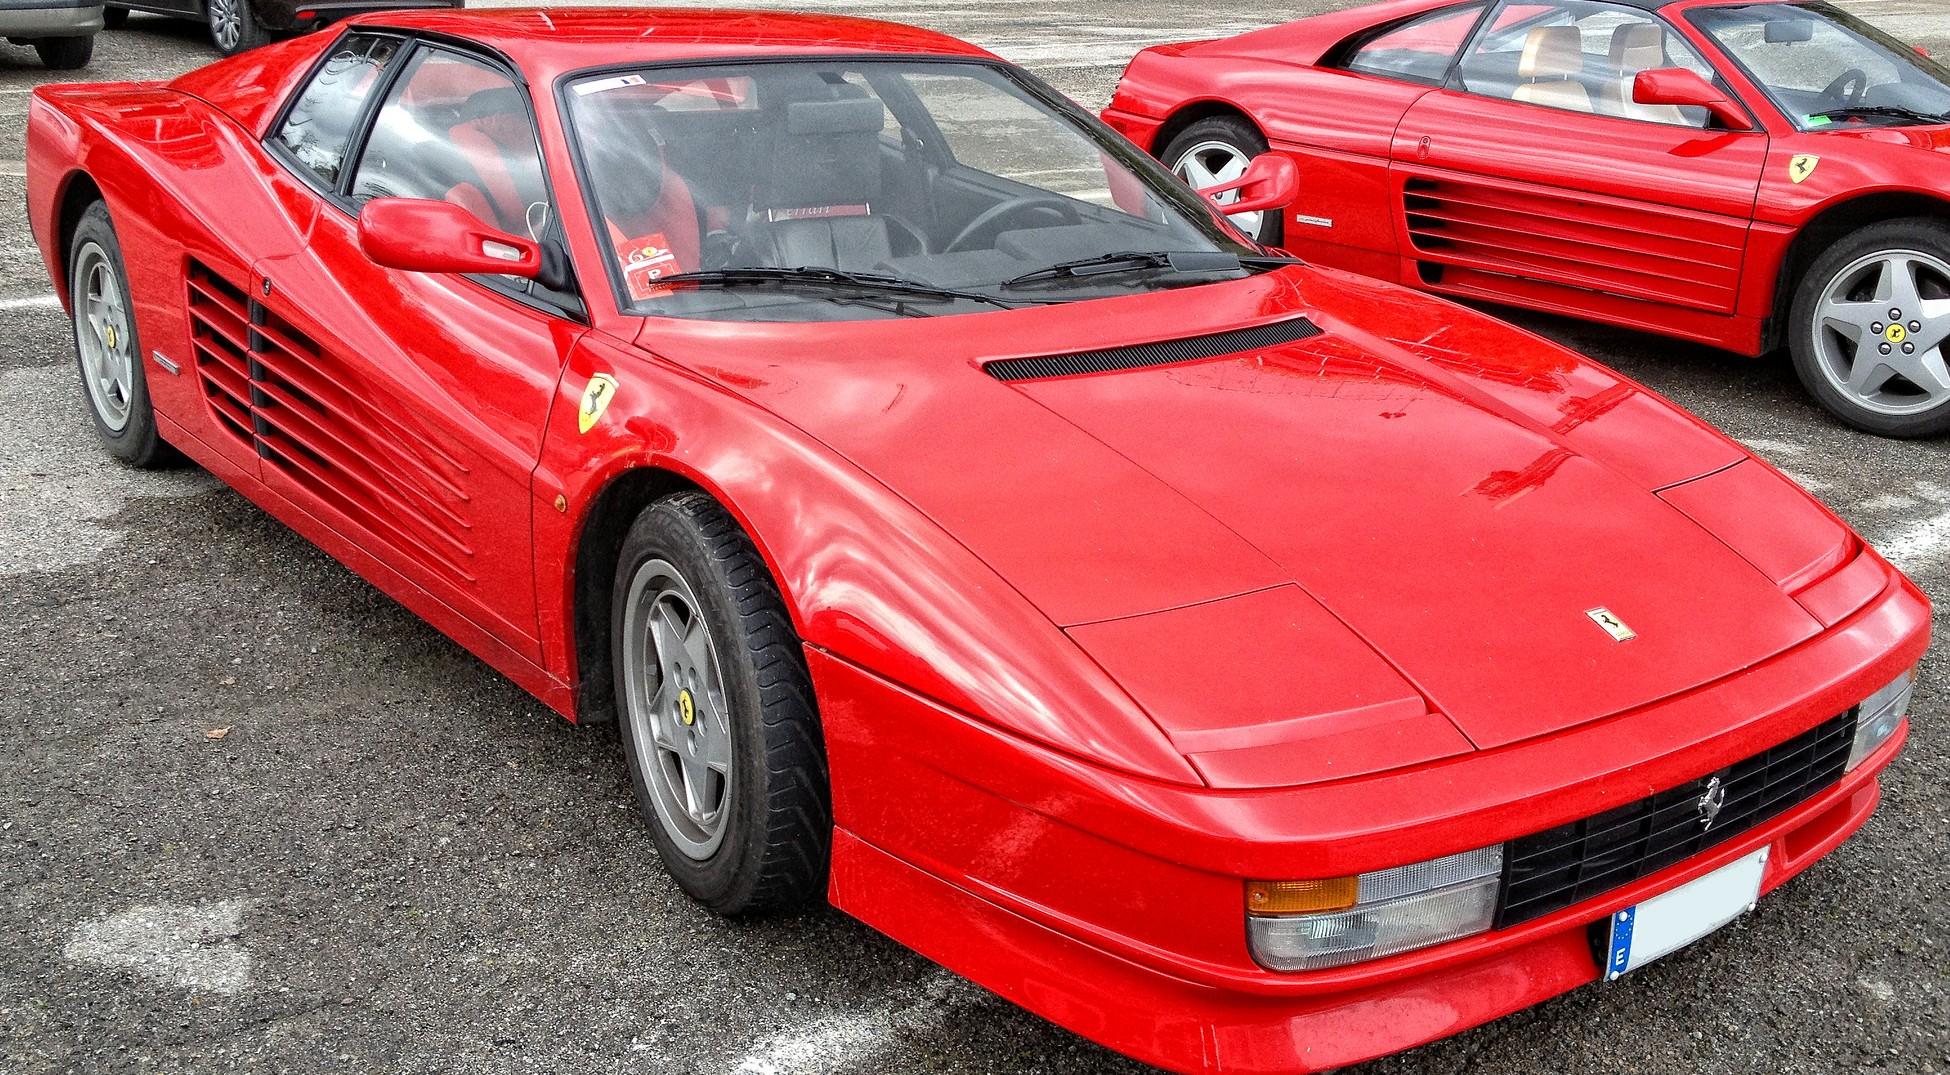 Vaccarella, Merzario, Ferrari, Jaguar e Porsche nel weekend a Nicolosi